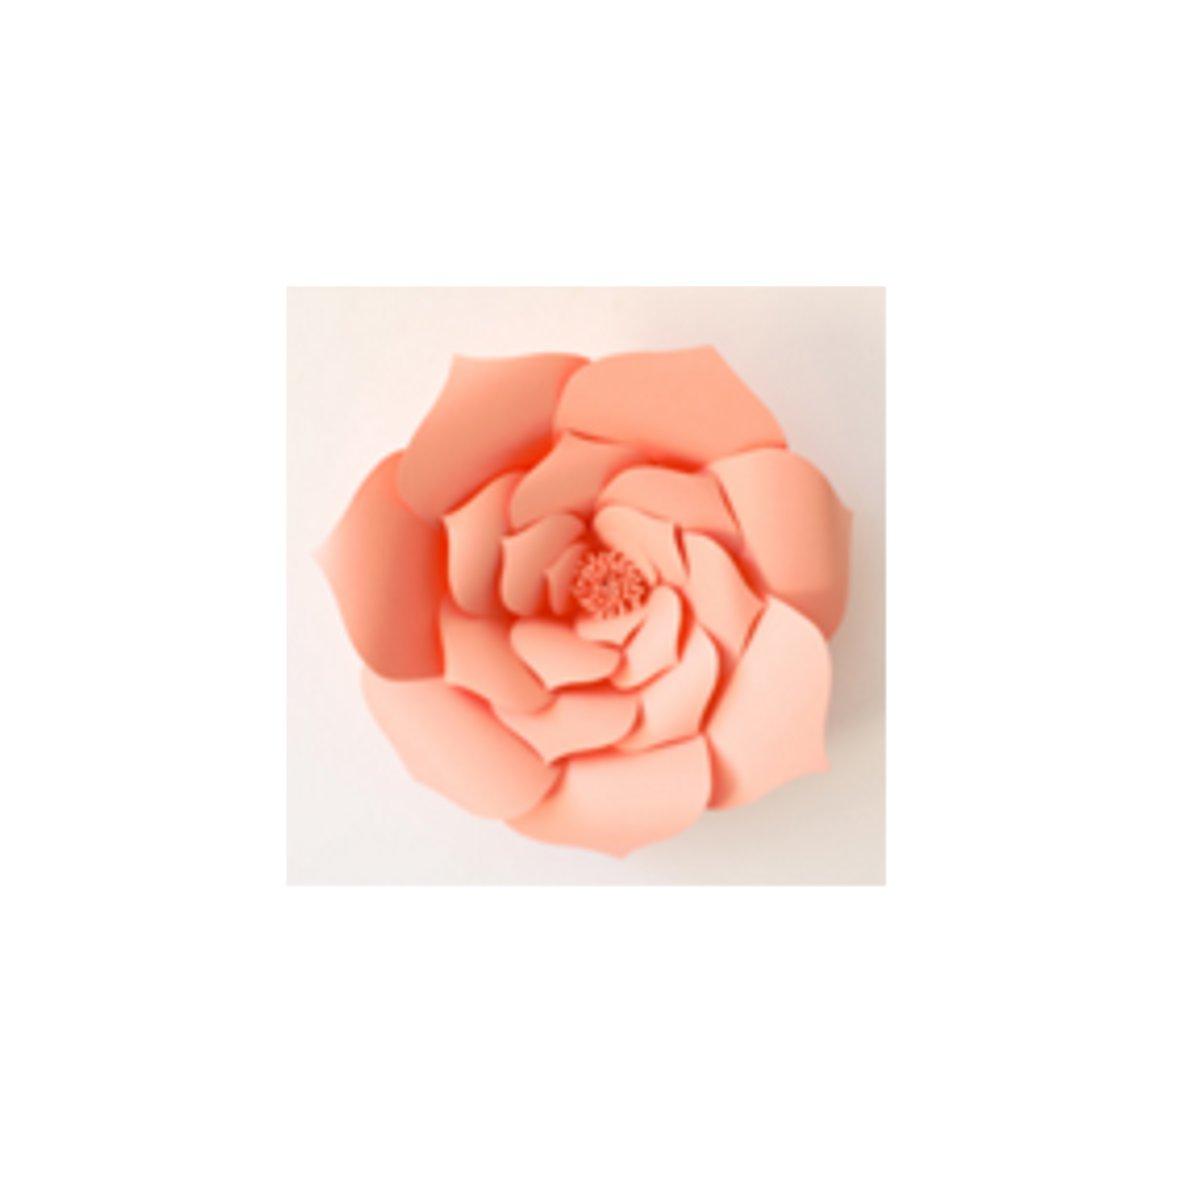 2pcs Giant Paper Rose Flower 20cm Diy Backdrop Wall Wedding Party